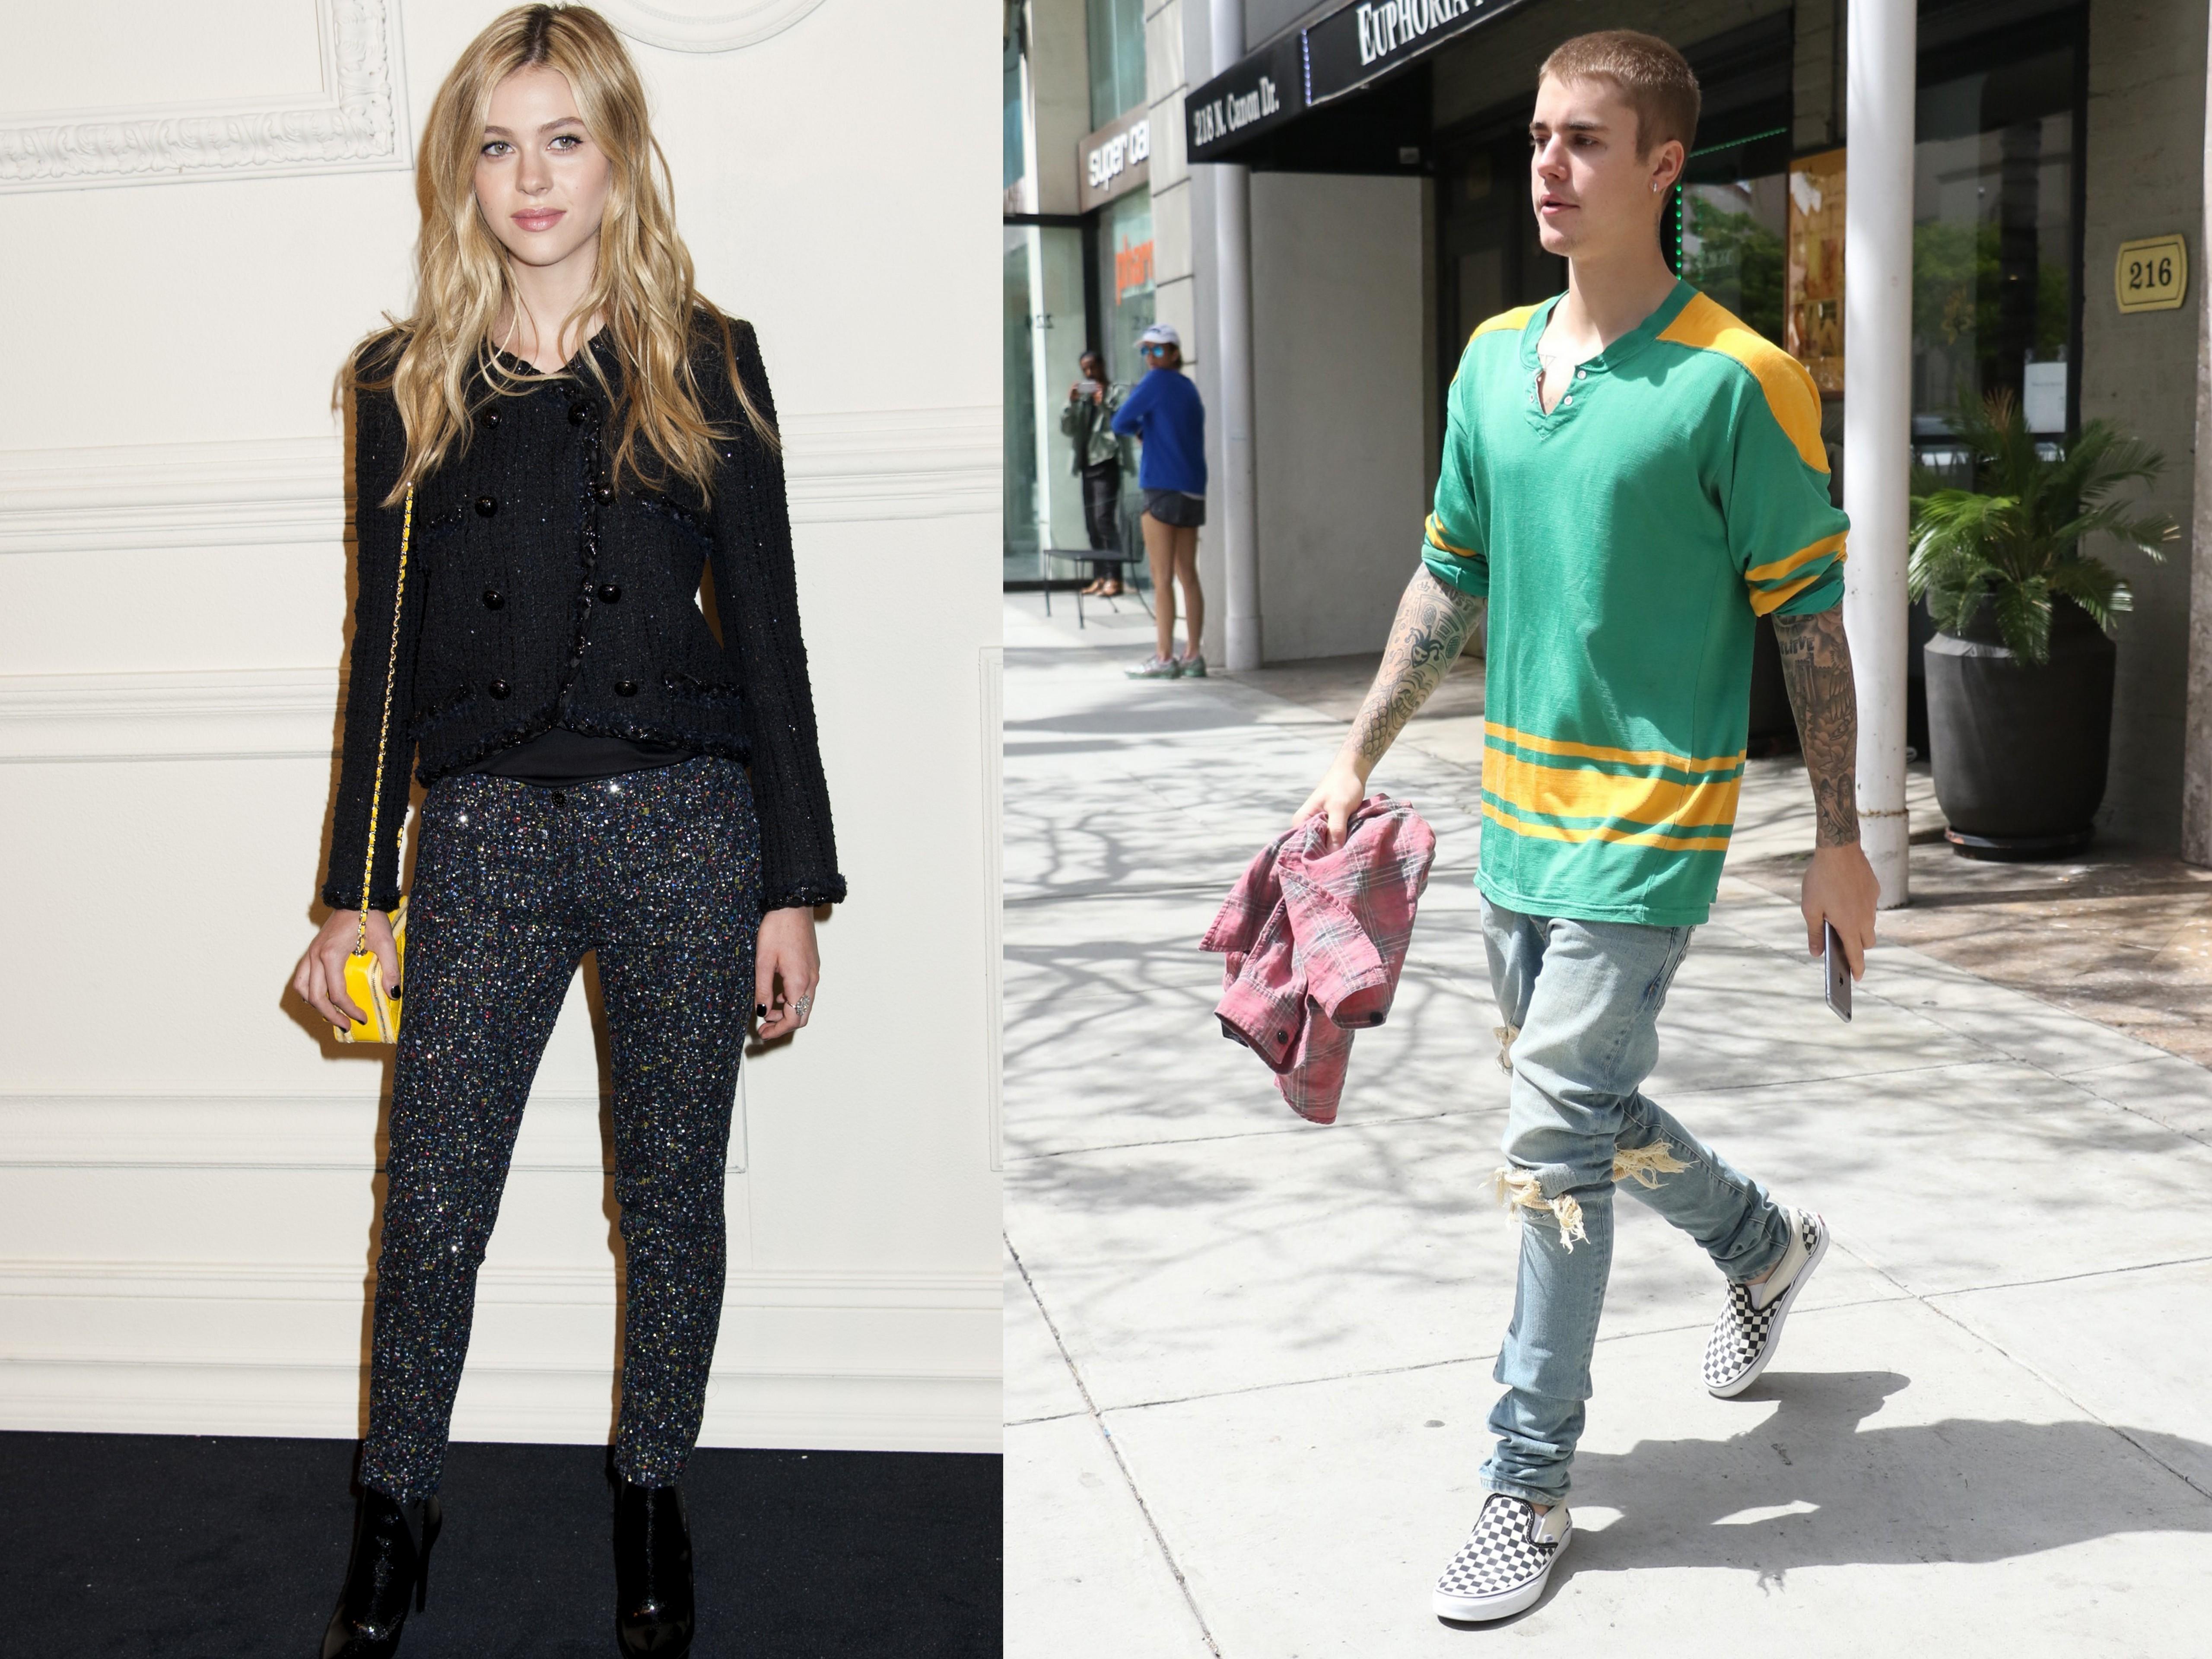 Justin Bieber enjoys a dinner date with Nicola Peltz